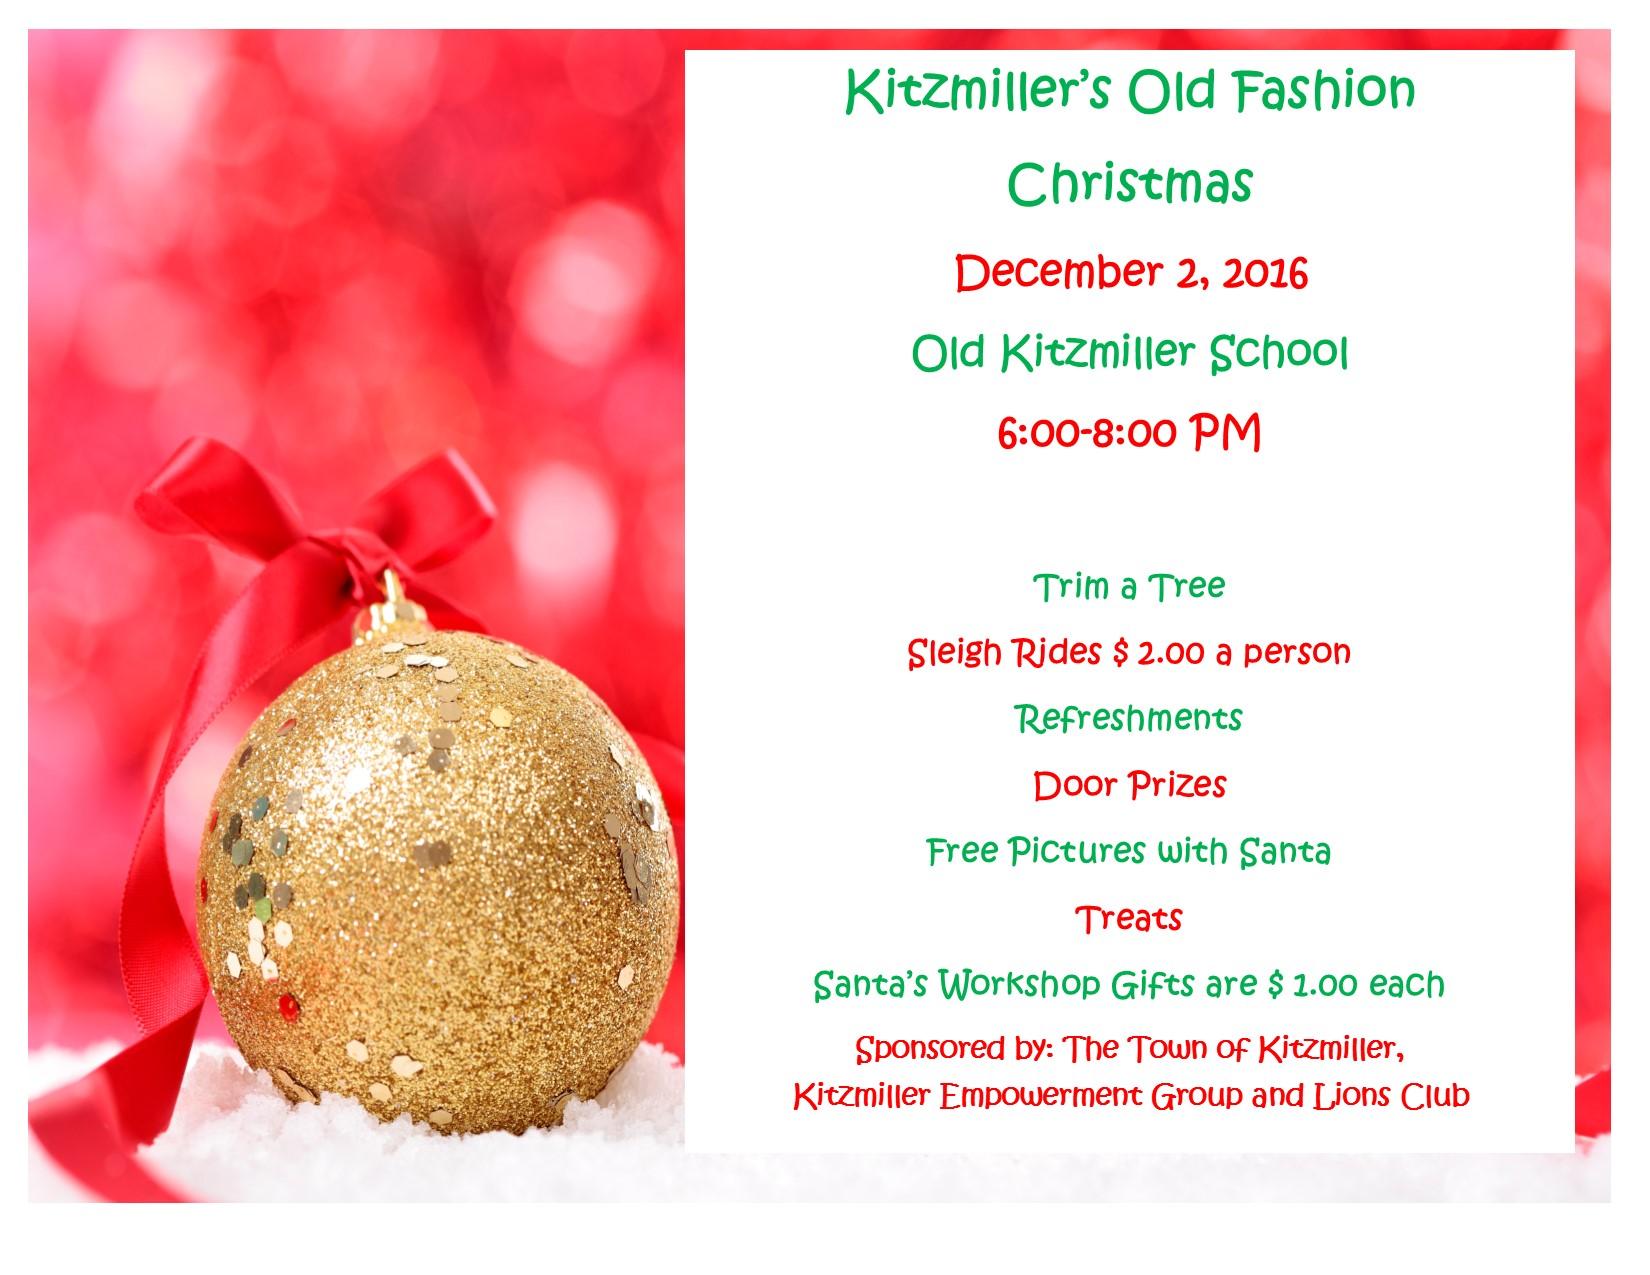 Kitzmiller Old Fashion Christmas - MyGarrettCounty.com